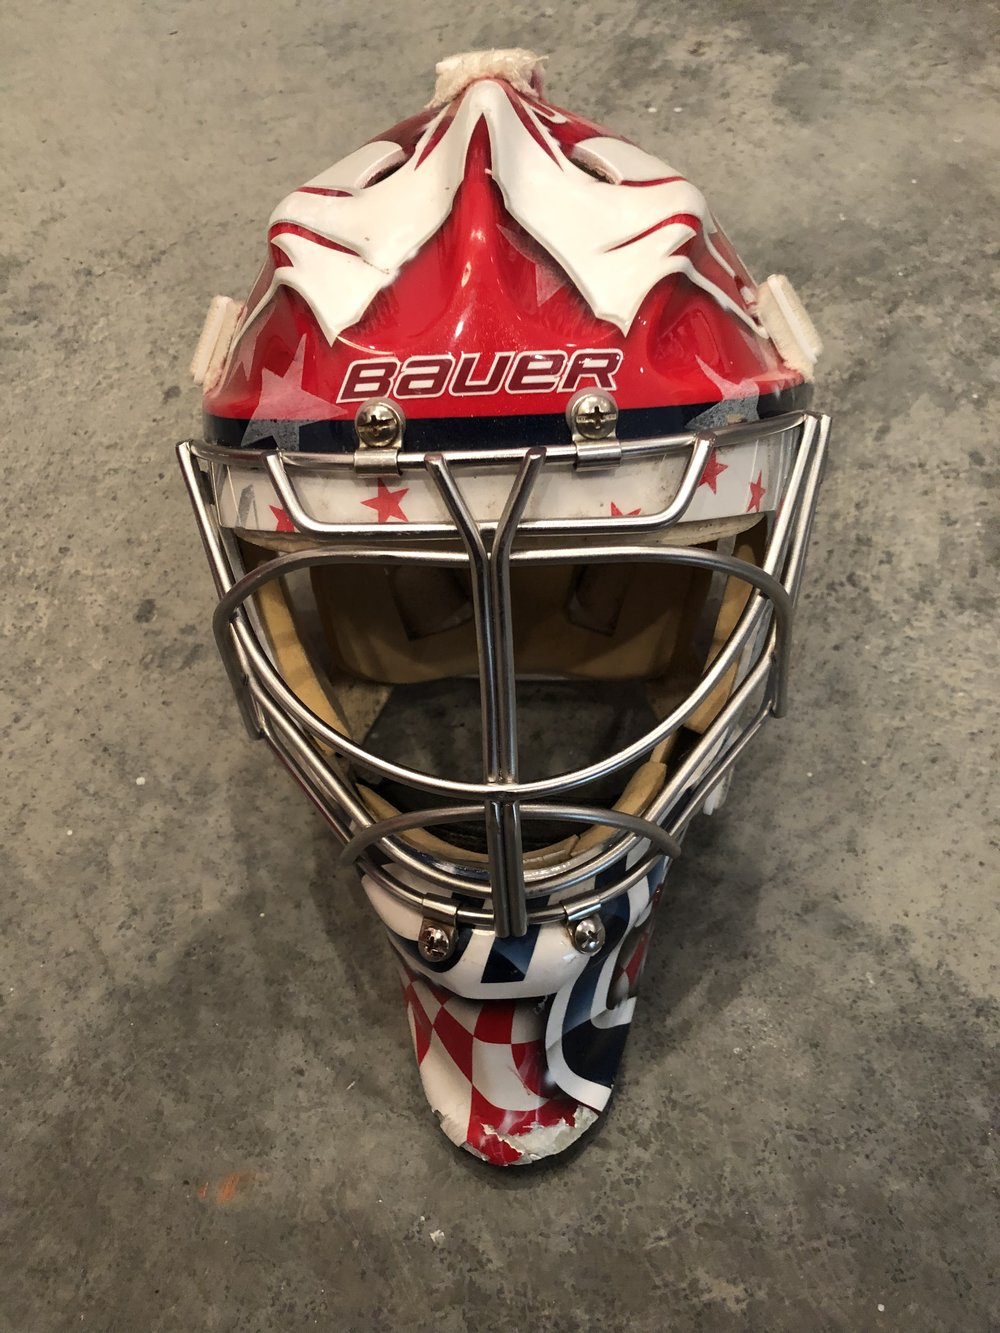 2012-13 Michal Neuvirth Washington Capitals game worn mask